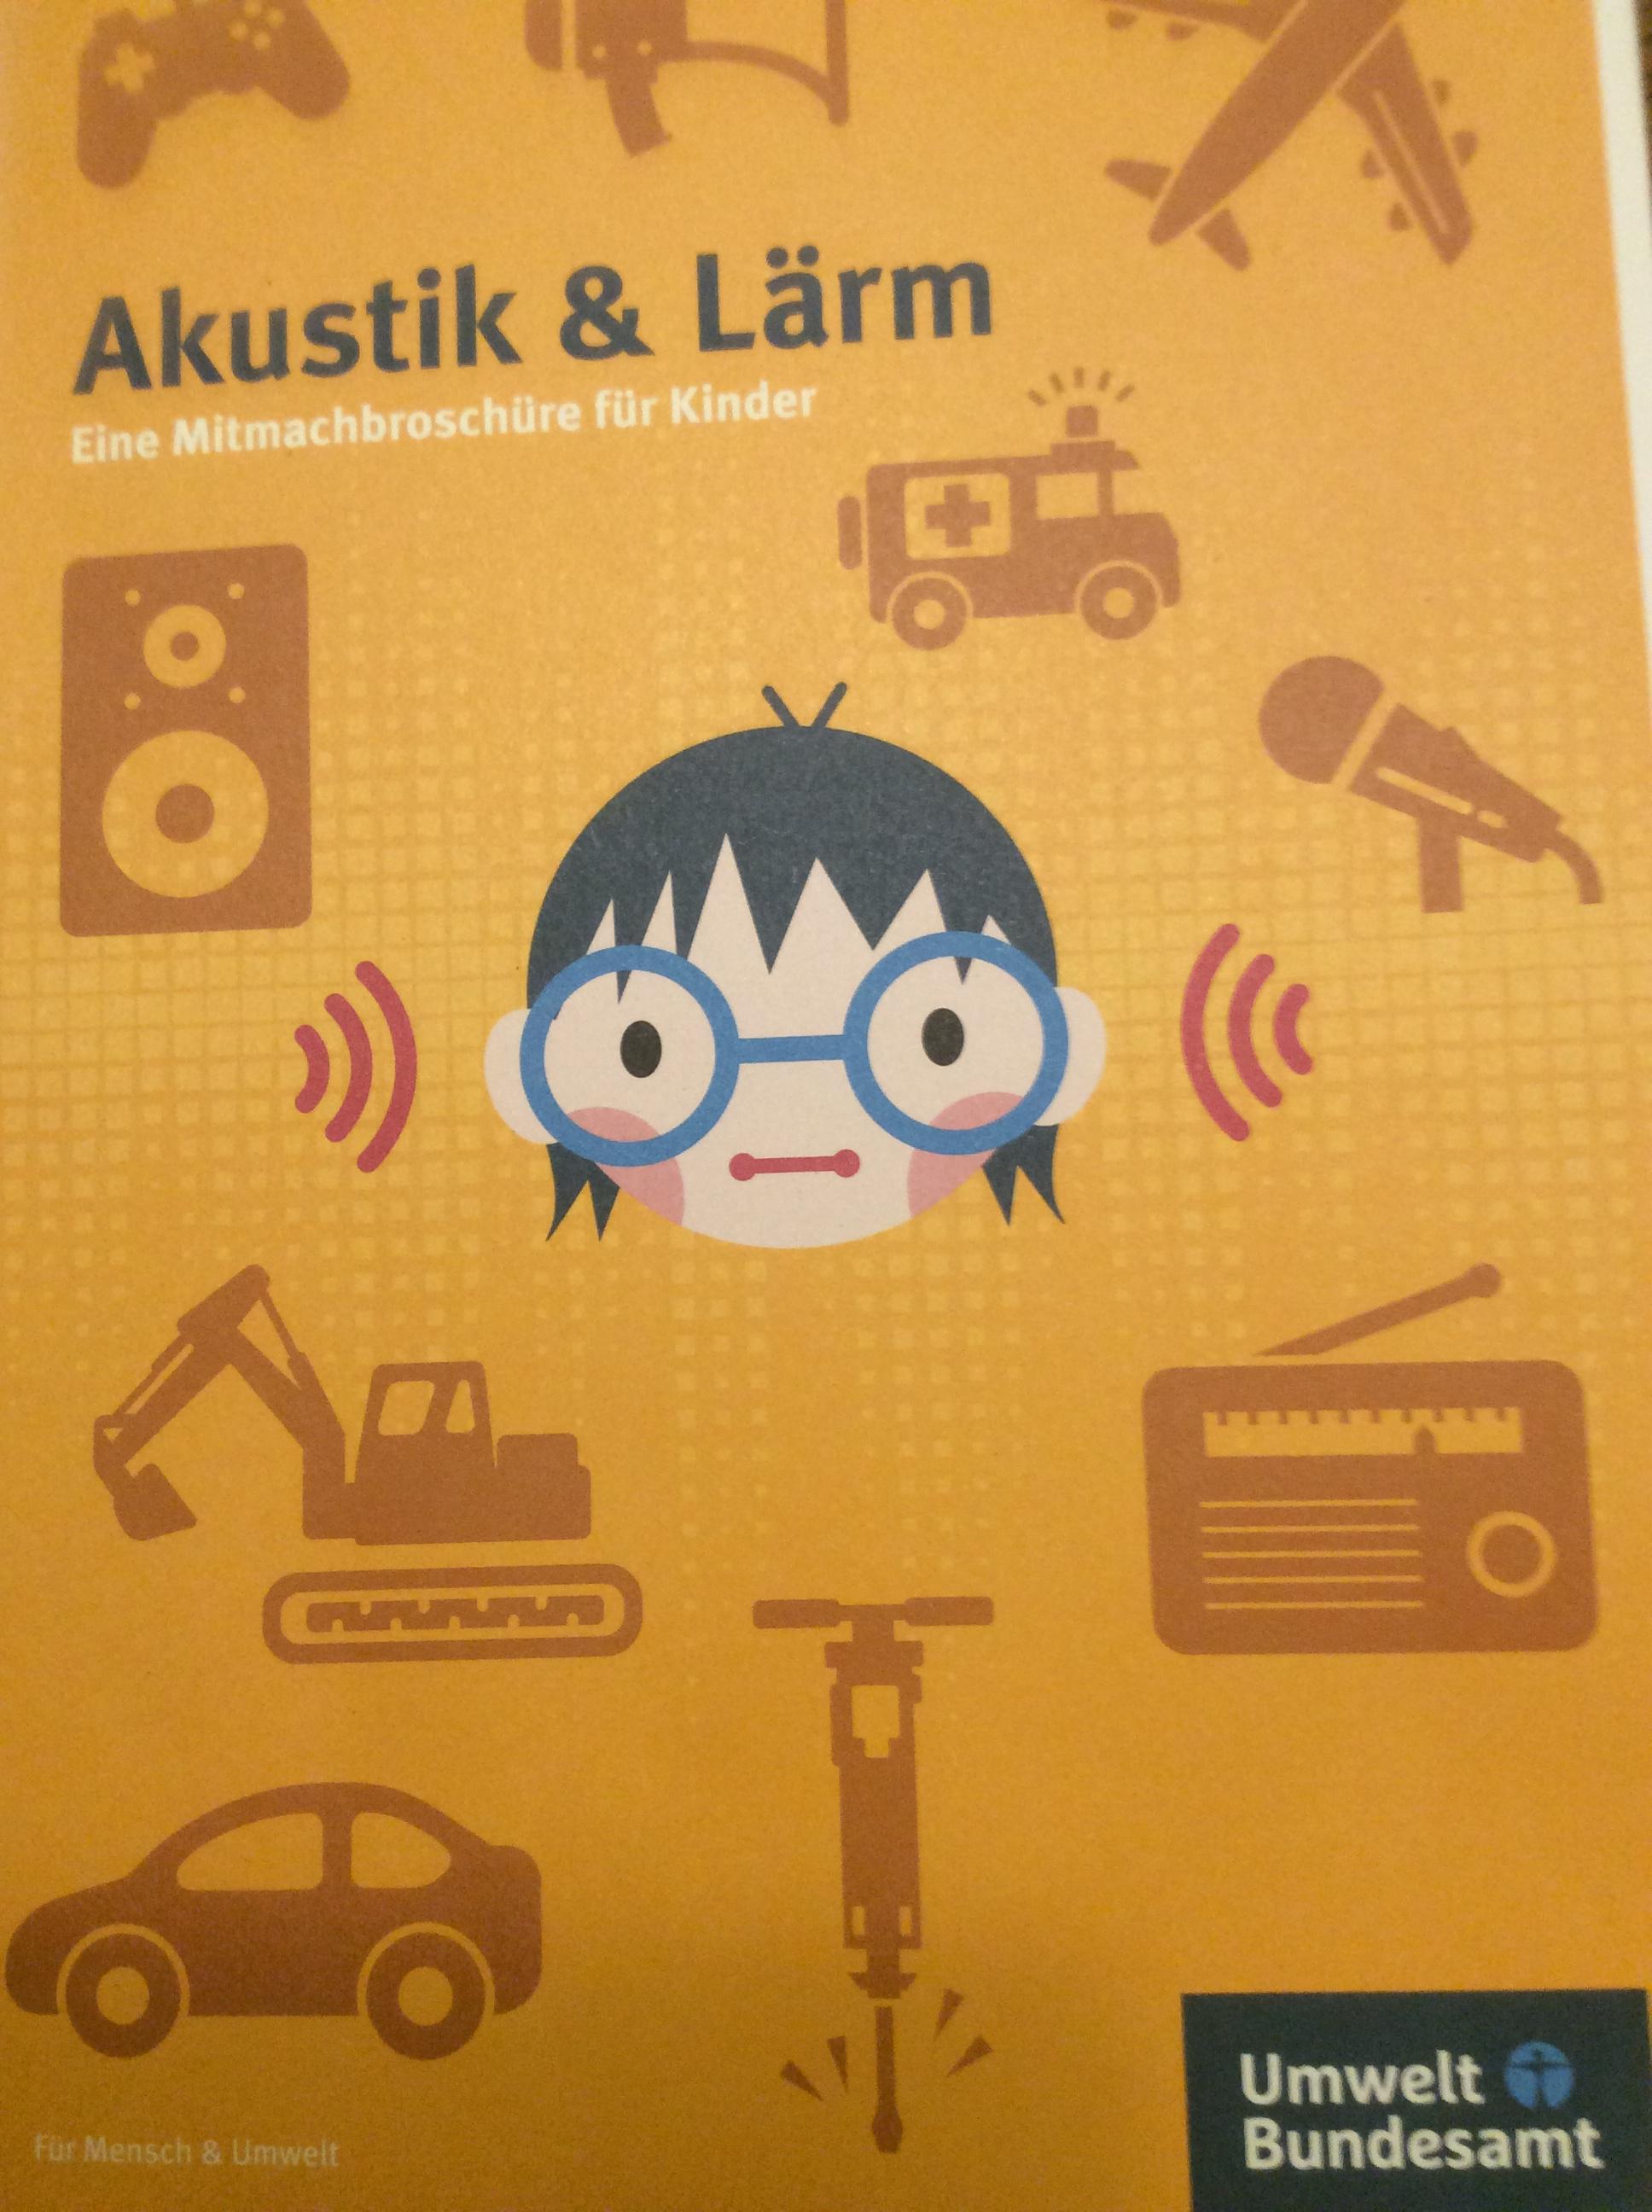 "(UBA) ""Akustik & Lärm"": kostenlose, kindgerechte Broschüre zum Thema Hören"